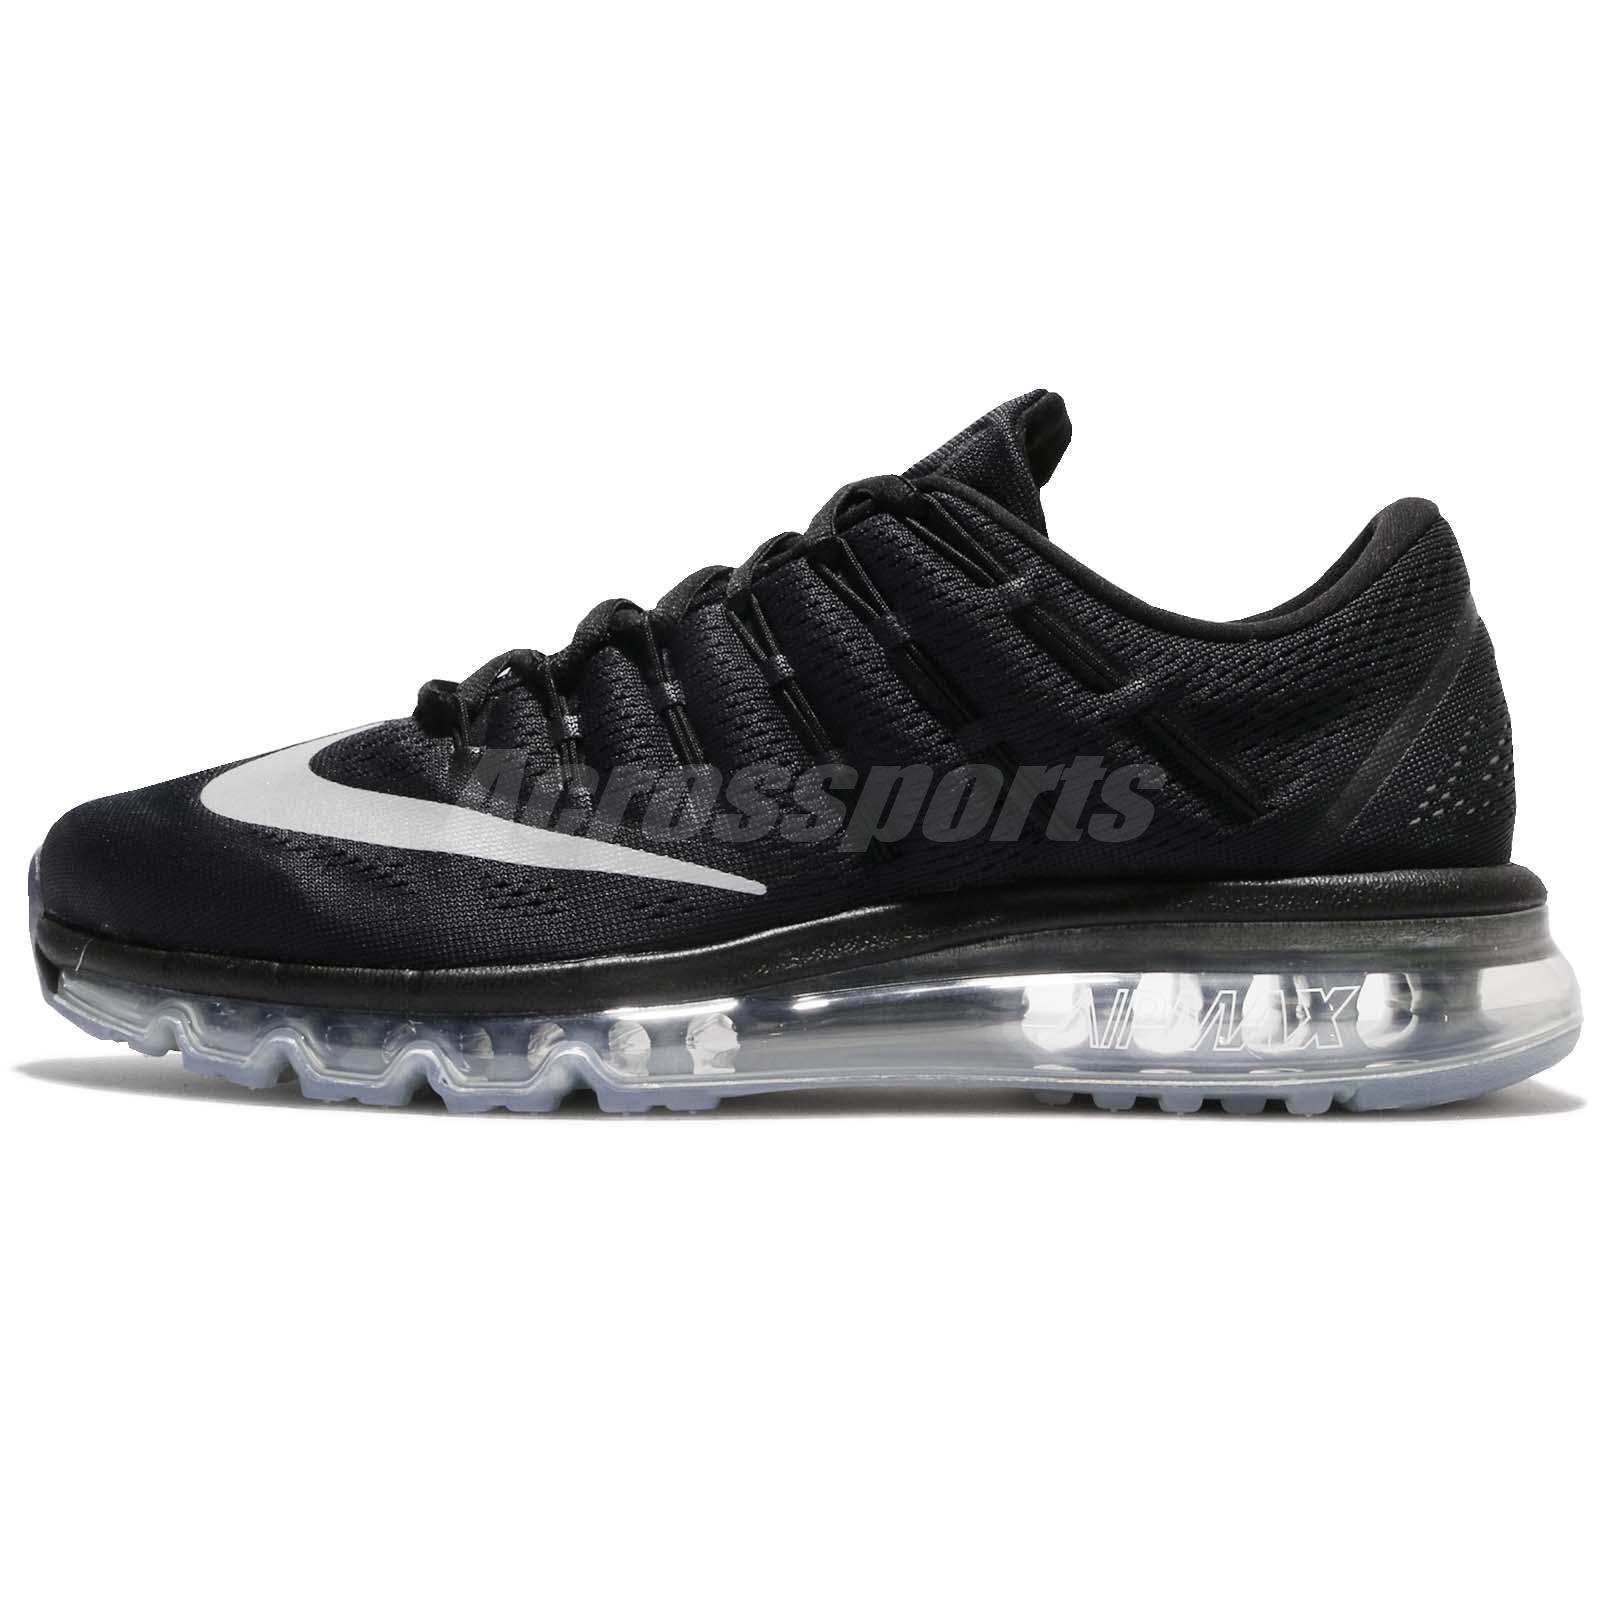 Nike Air Max 2016 Black Grey Mens Running Shoes Sneakers Trainers 806771 001